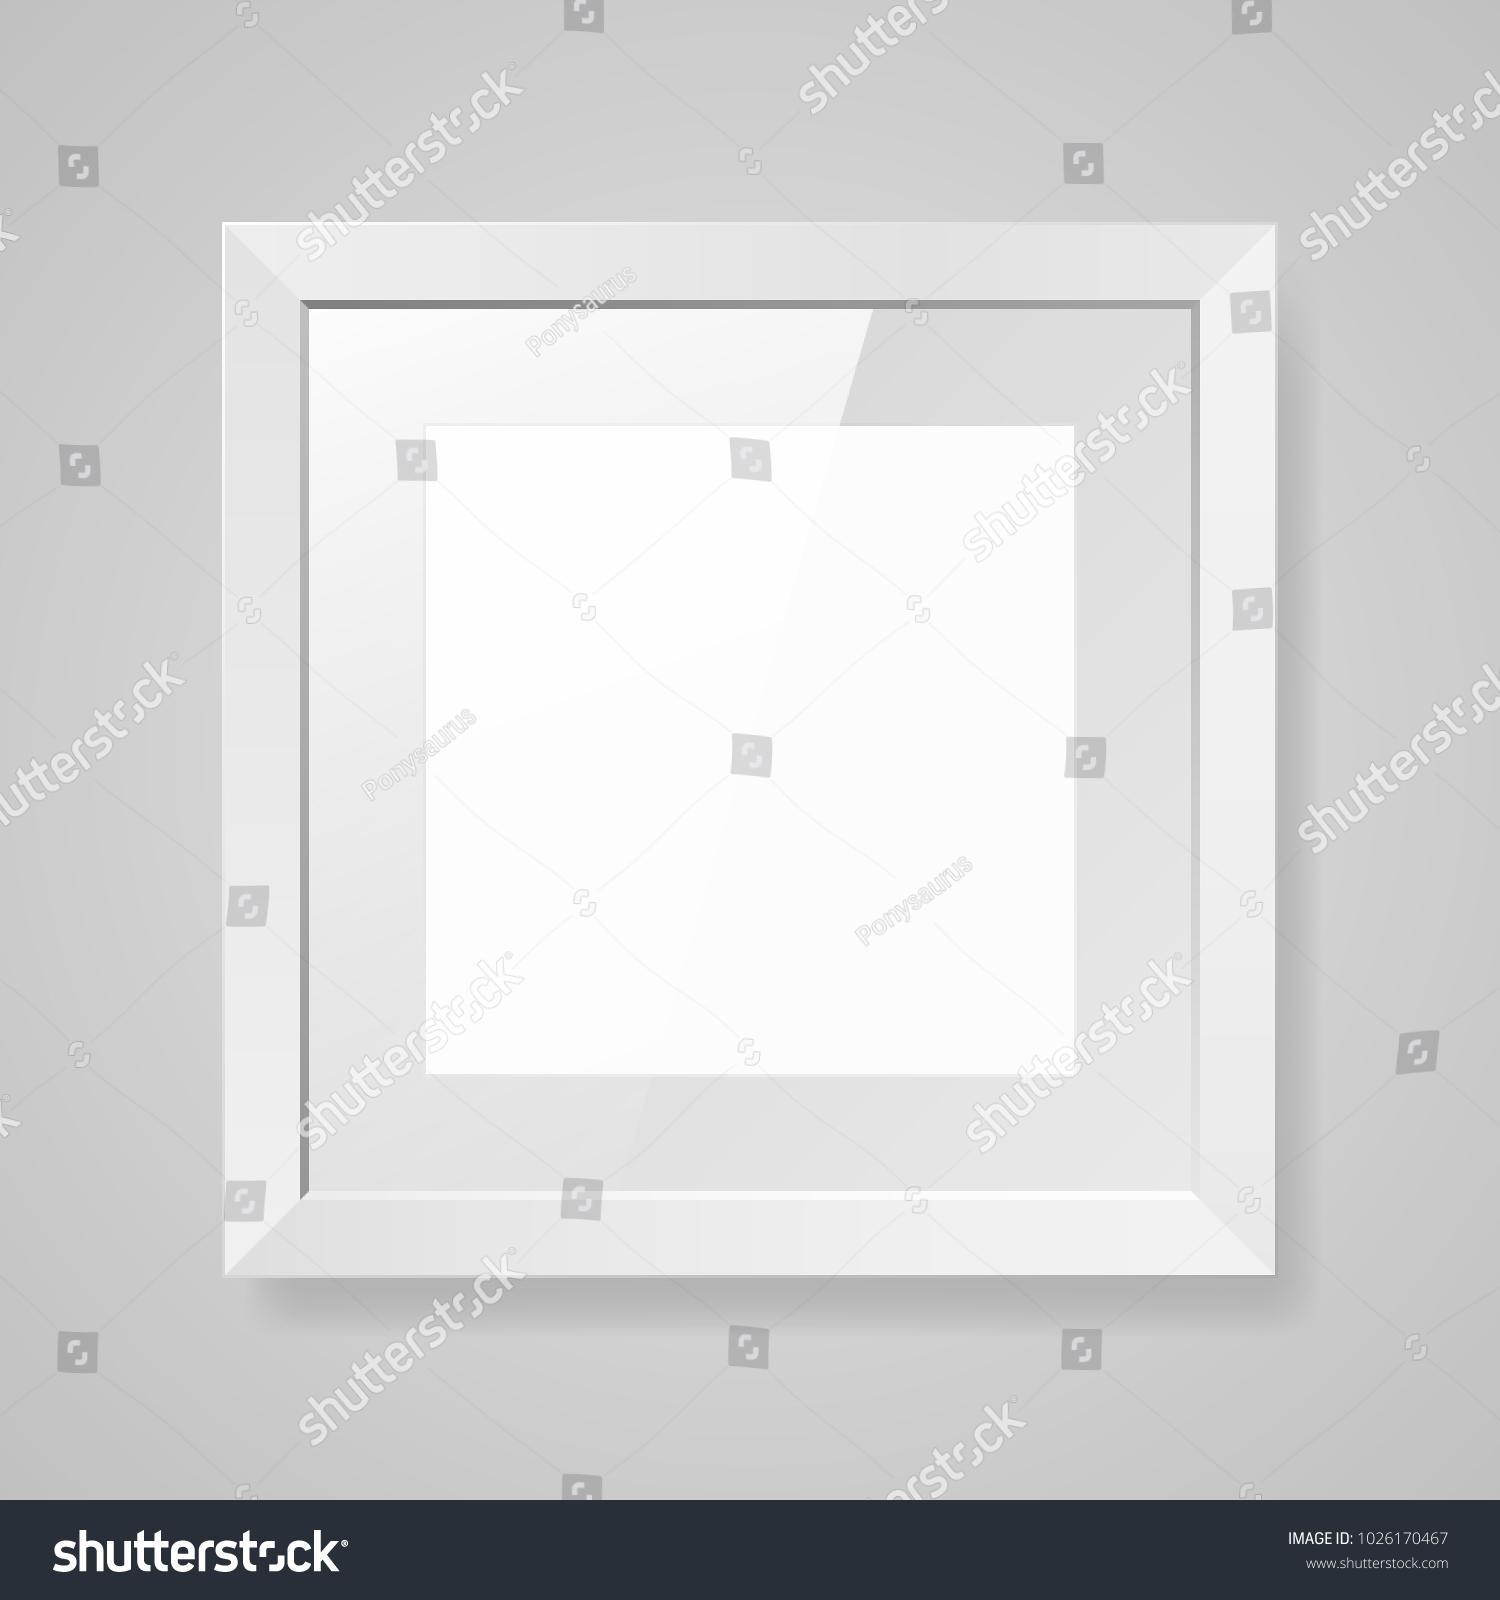 Realistic Empty Square White Frame Glass Stock Vector (2018 ...